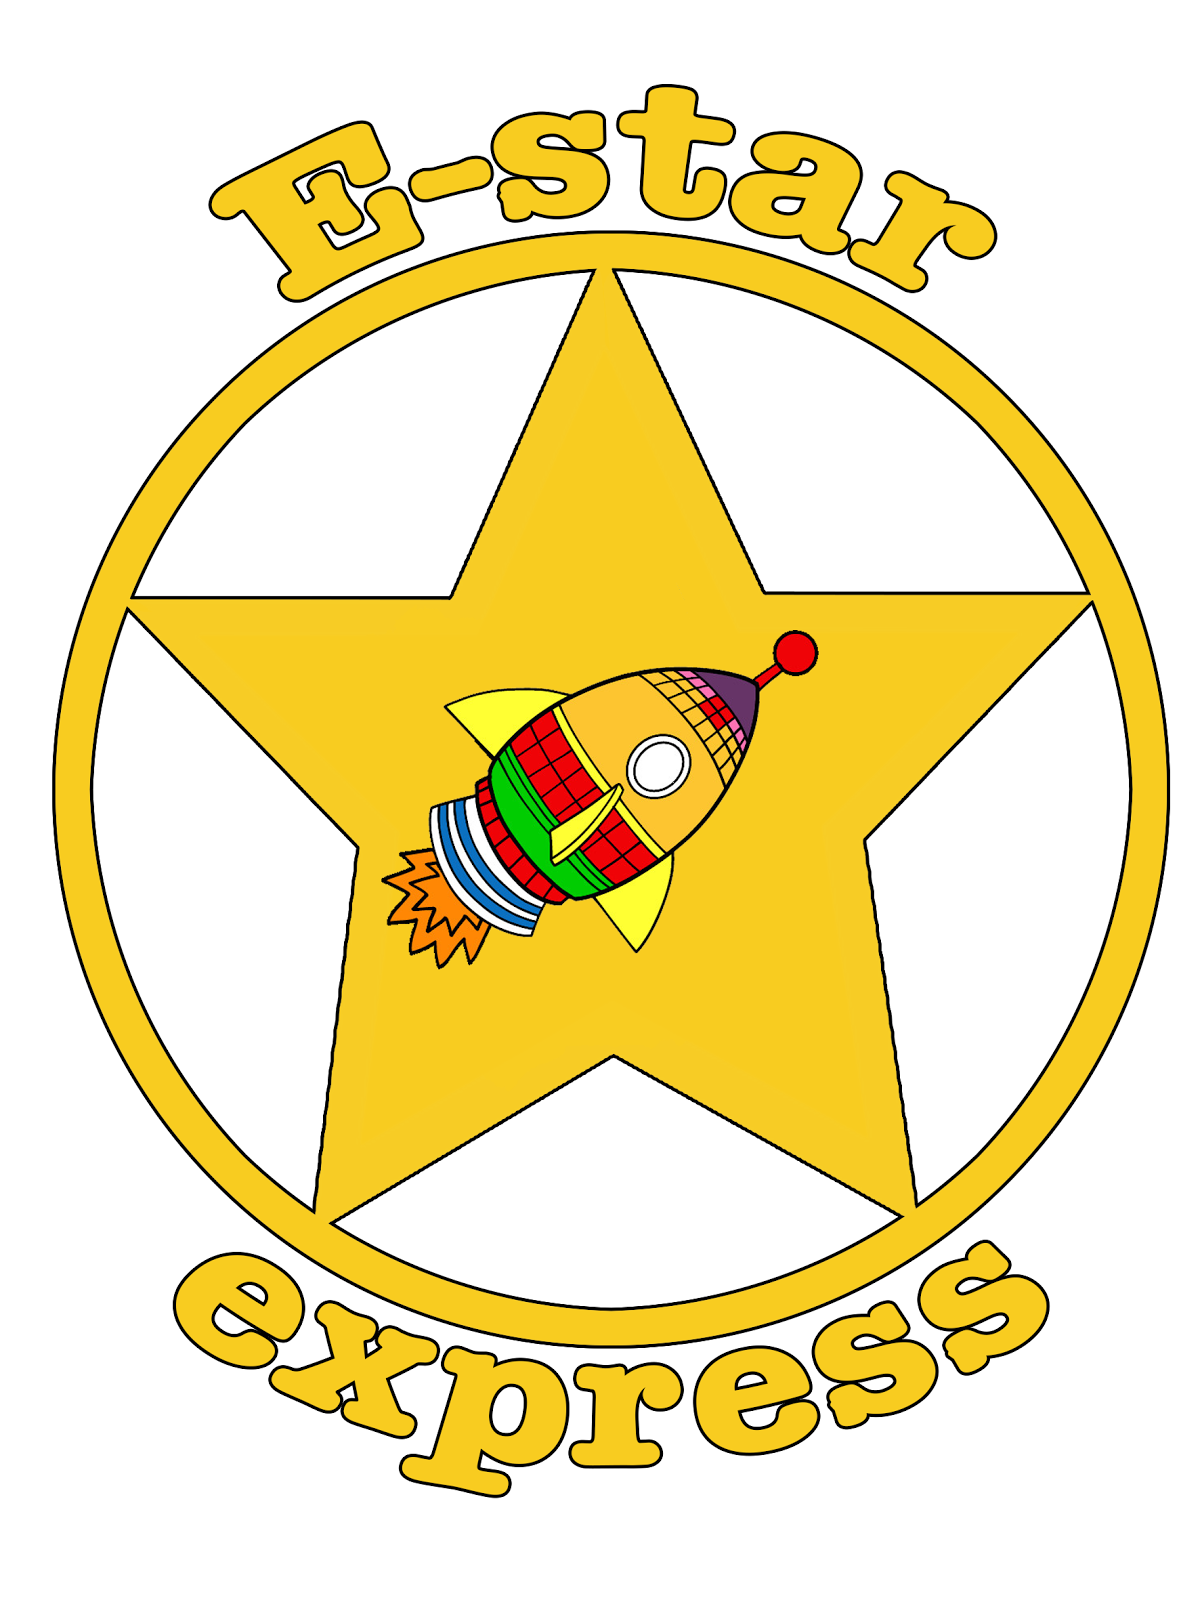 E-star Express